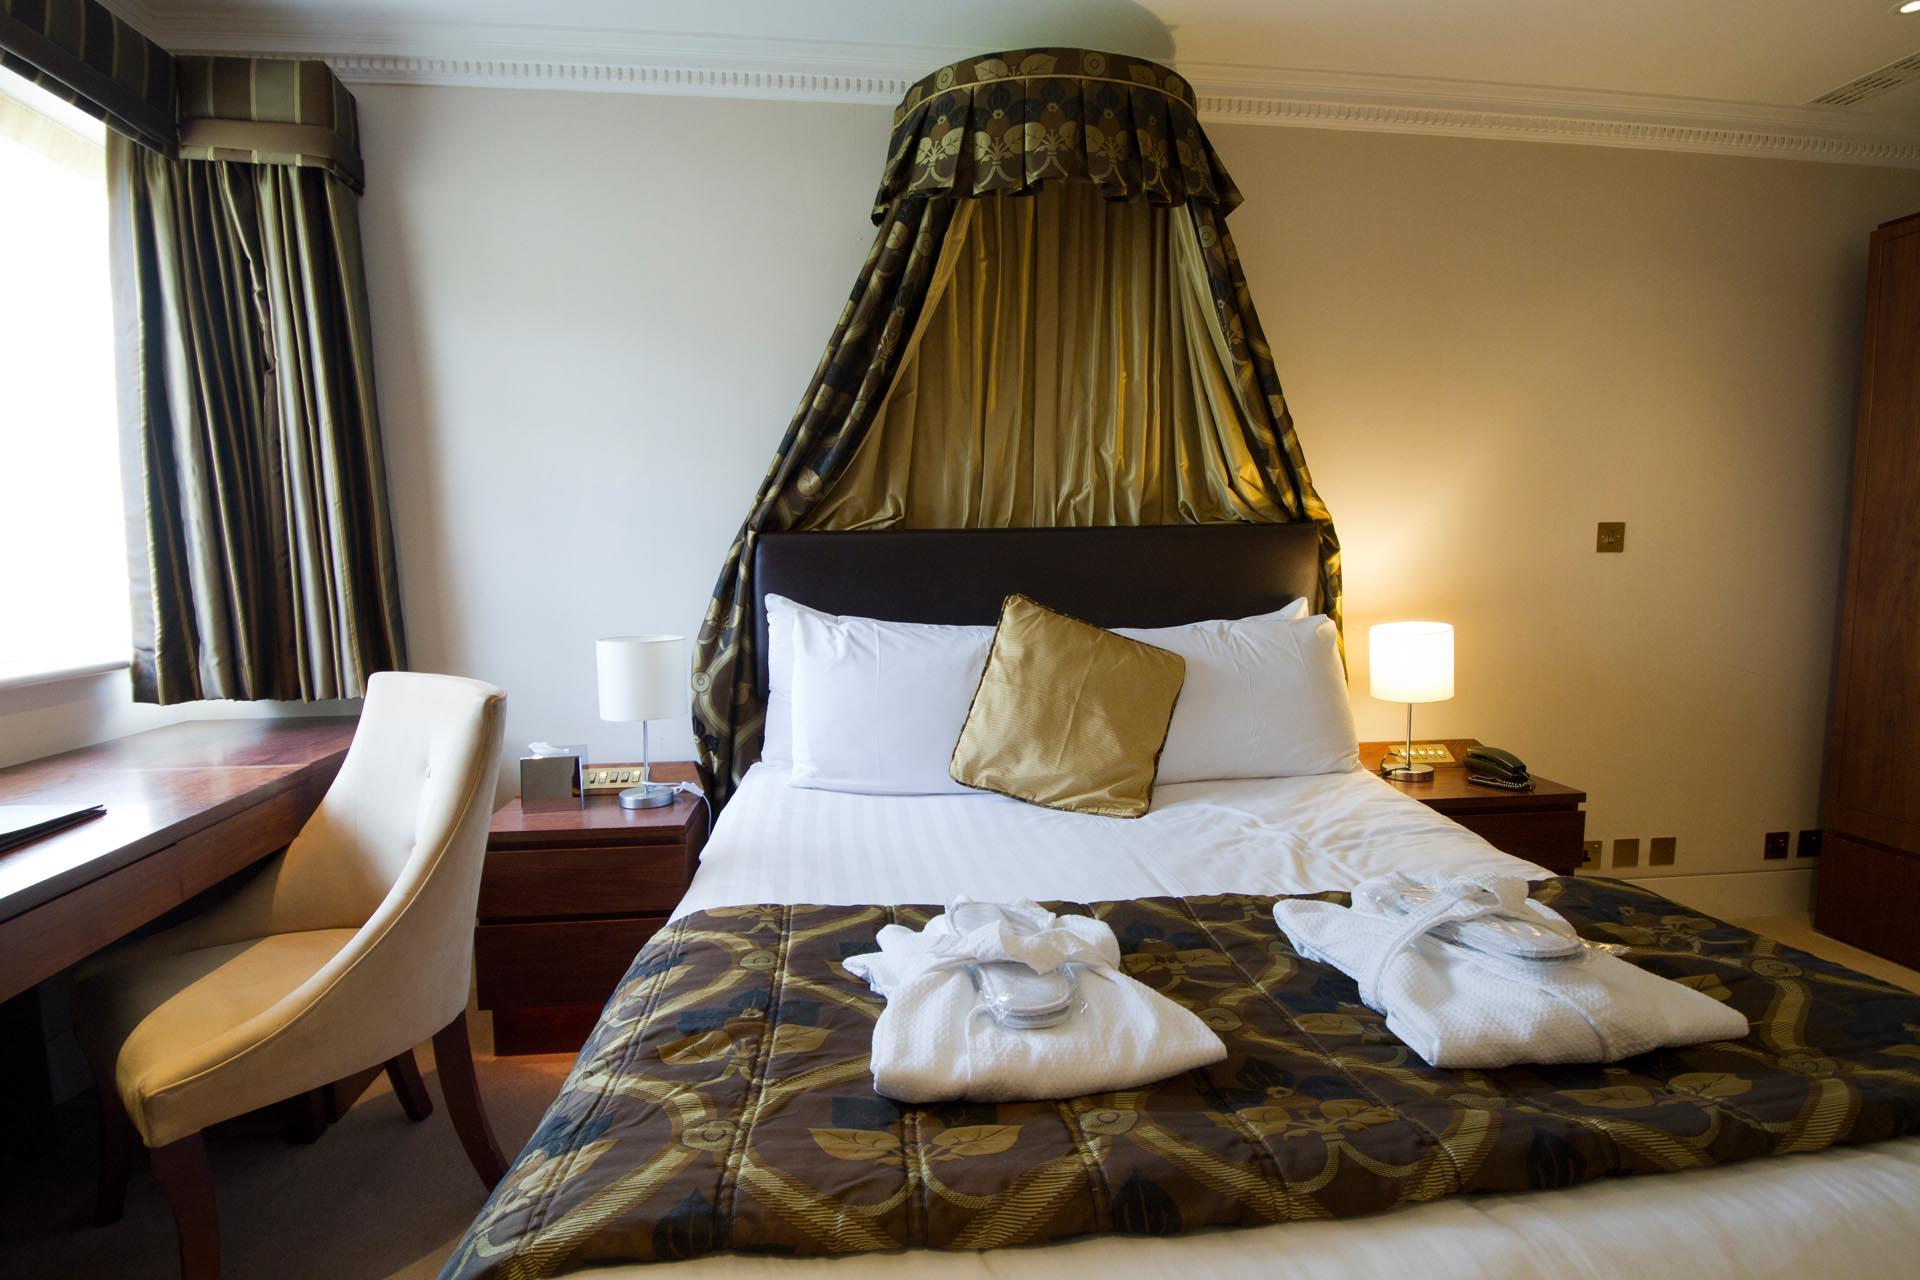 Executive Room at Barn Hotel Ruislip near London